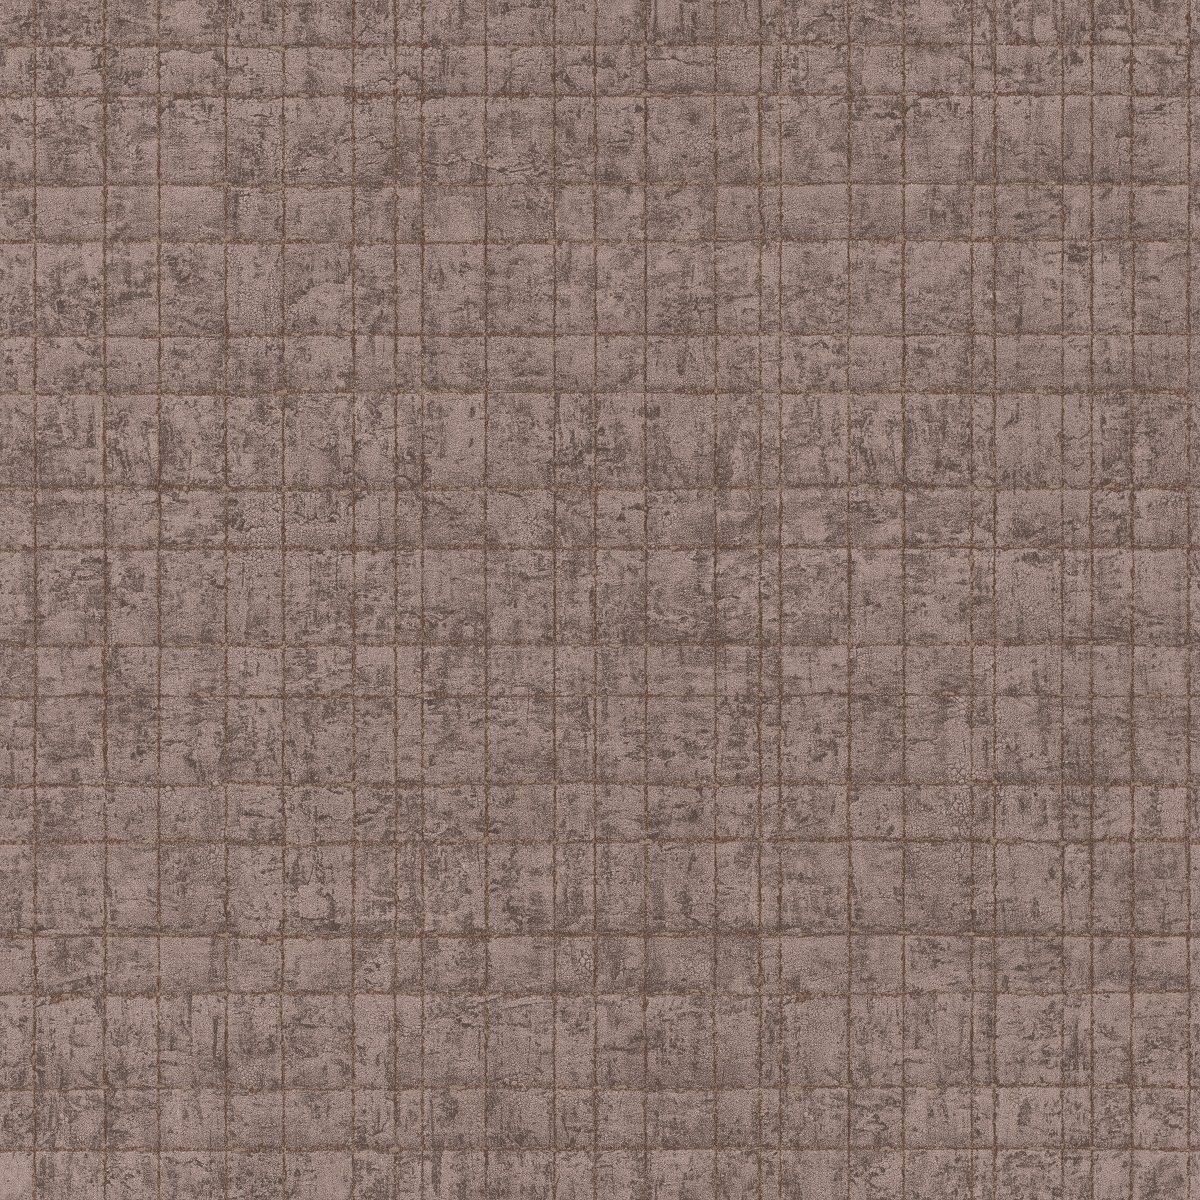 Papel mural geométrico café y dorado KERALA 551341 RASCH